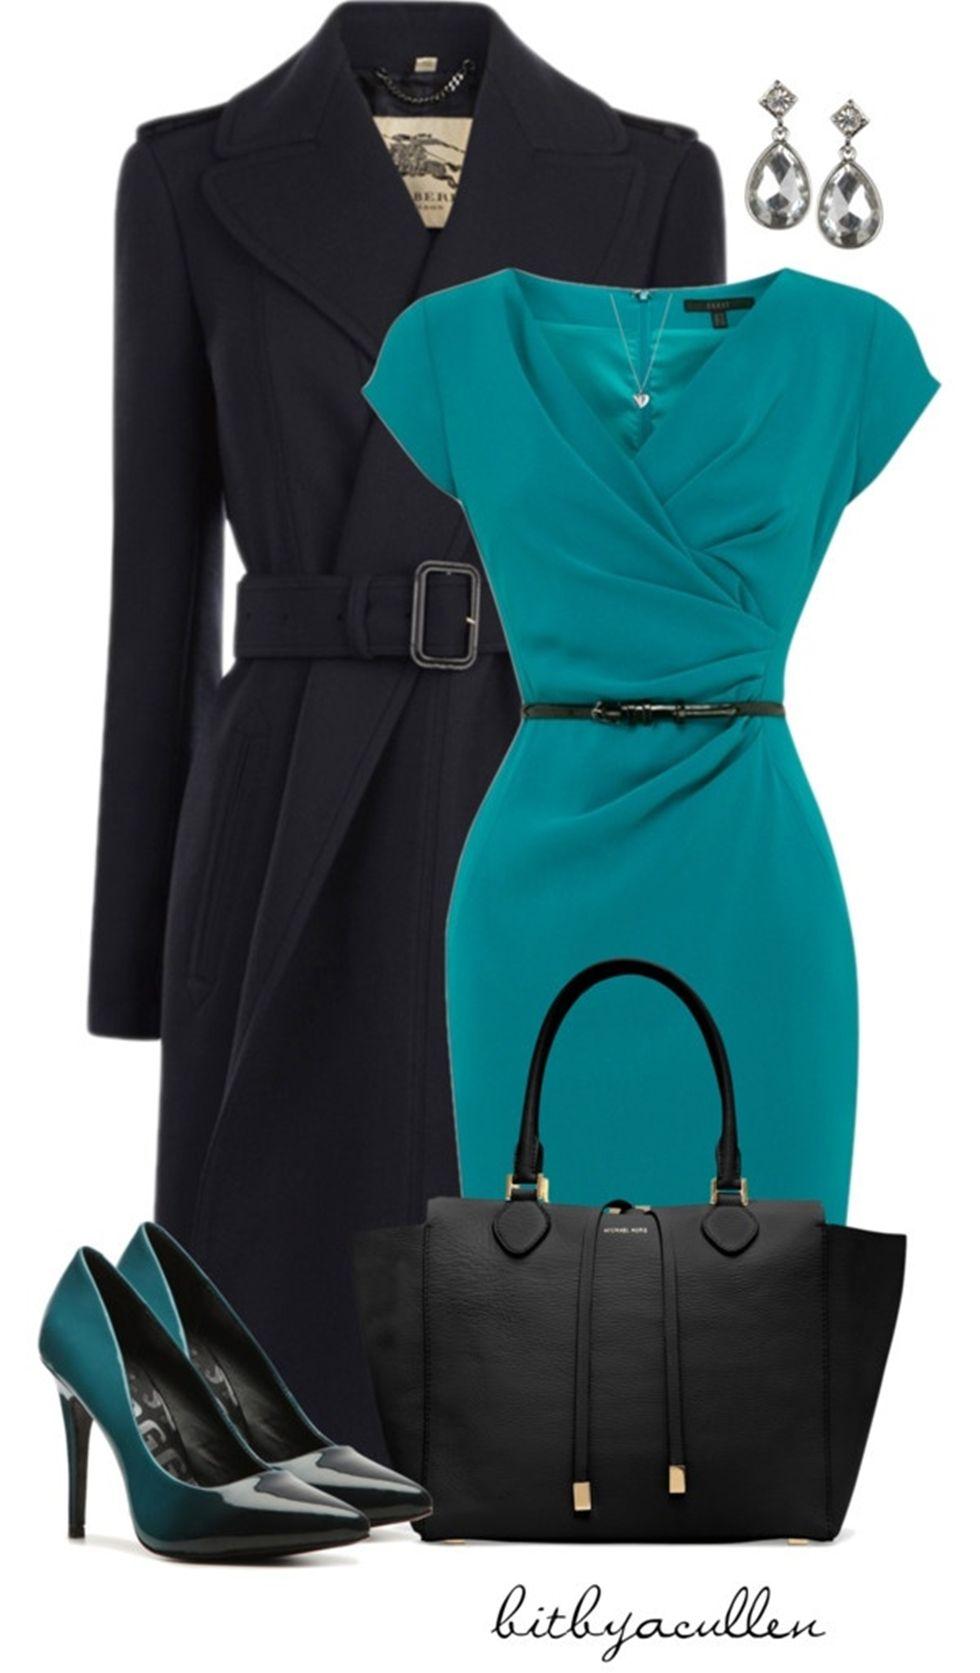 0a2b066ef2d00b3031ac94c762b72c3b Perfect Women Business Attire 2014 ...